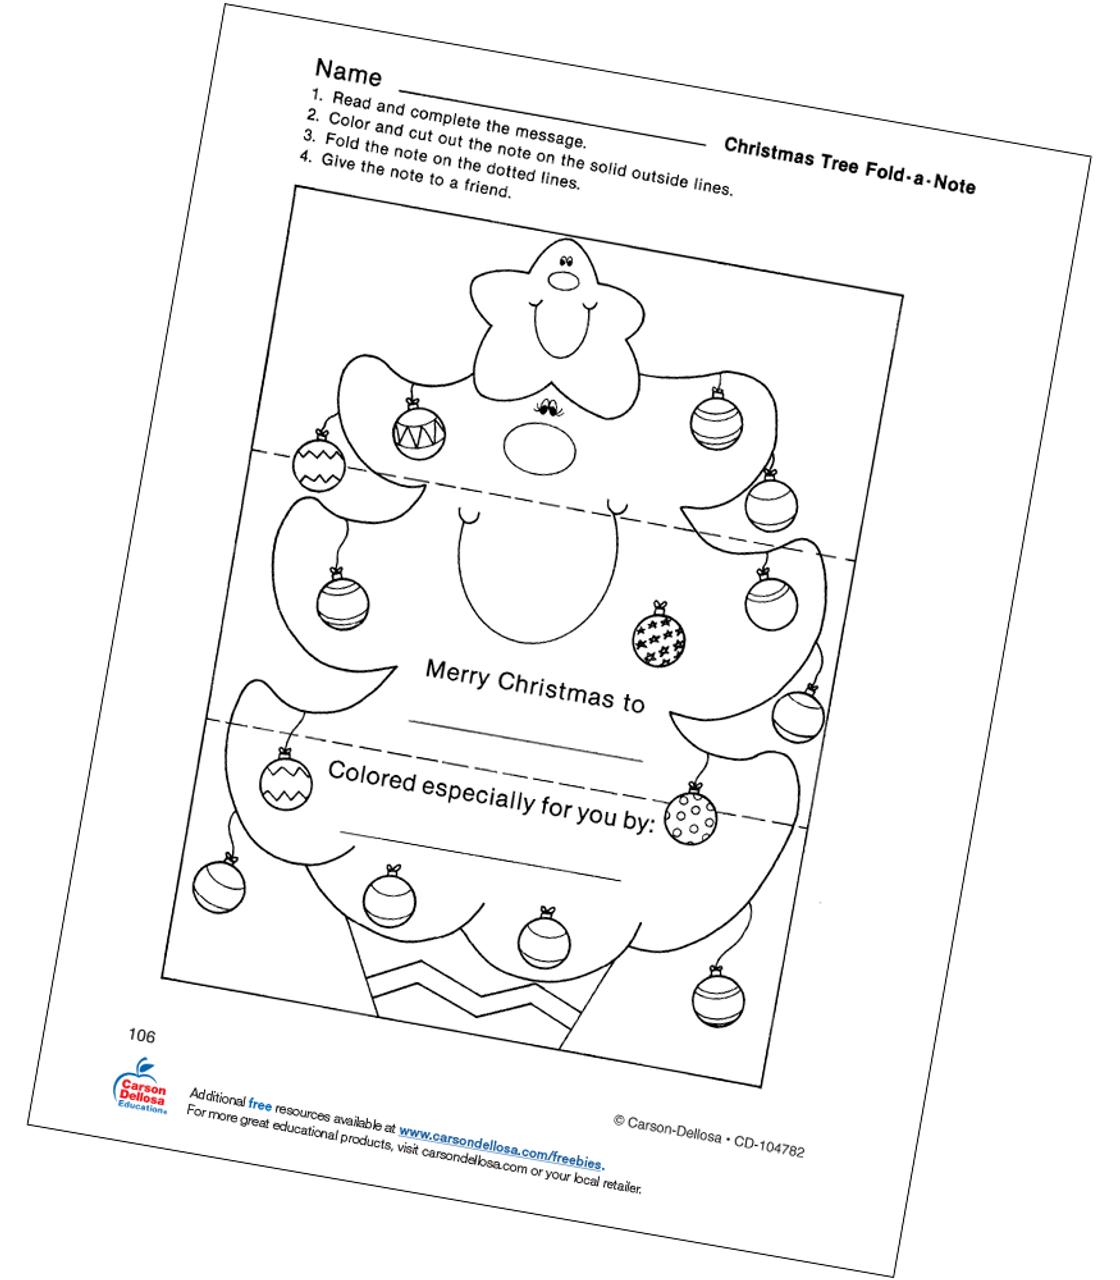 Christmas Tree Fold A Note Activity Grades Pk 1 Free Printable Carson Dellosa